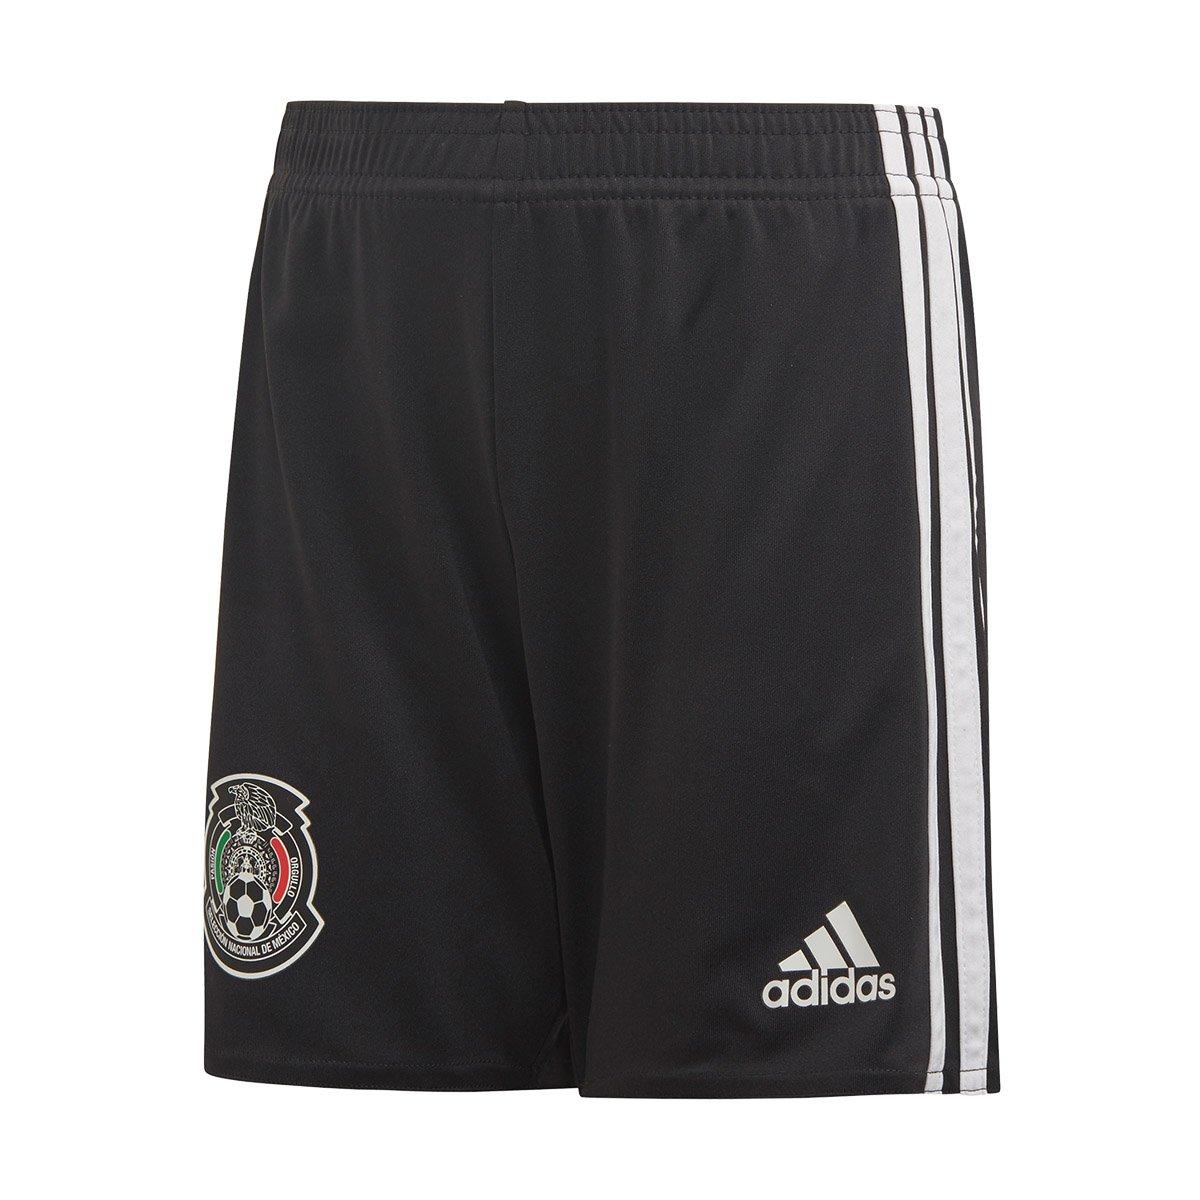 Minikit México Soccer Adidas